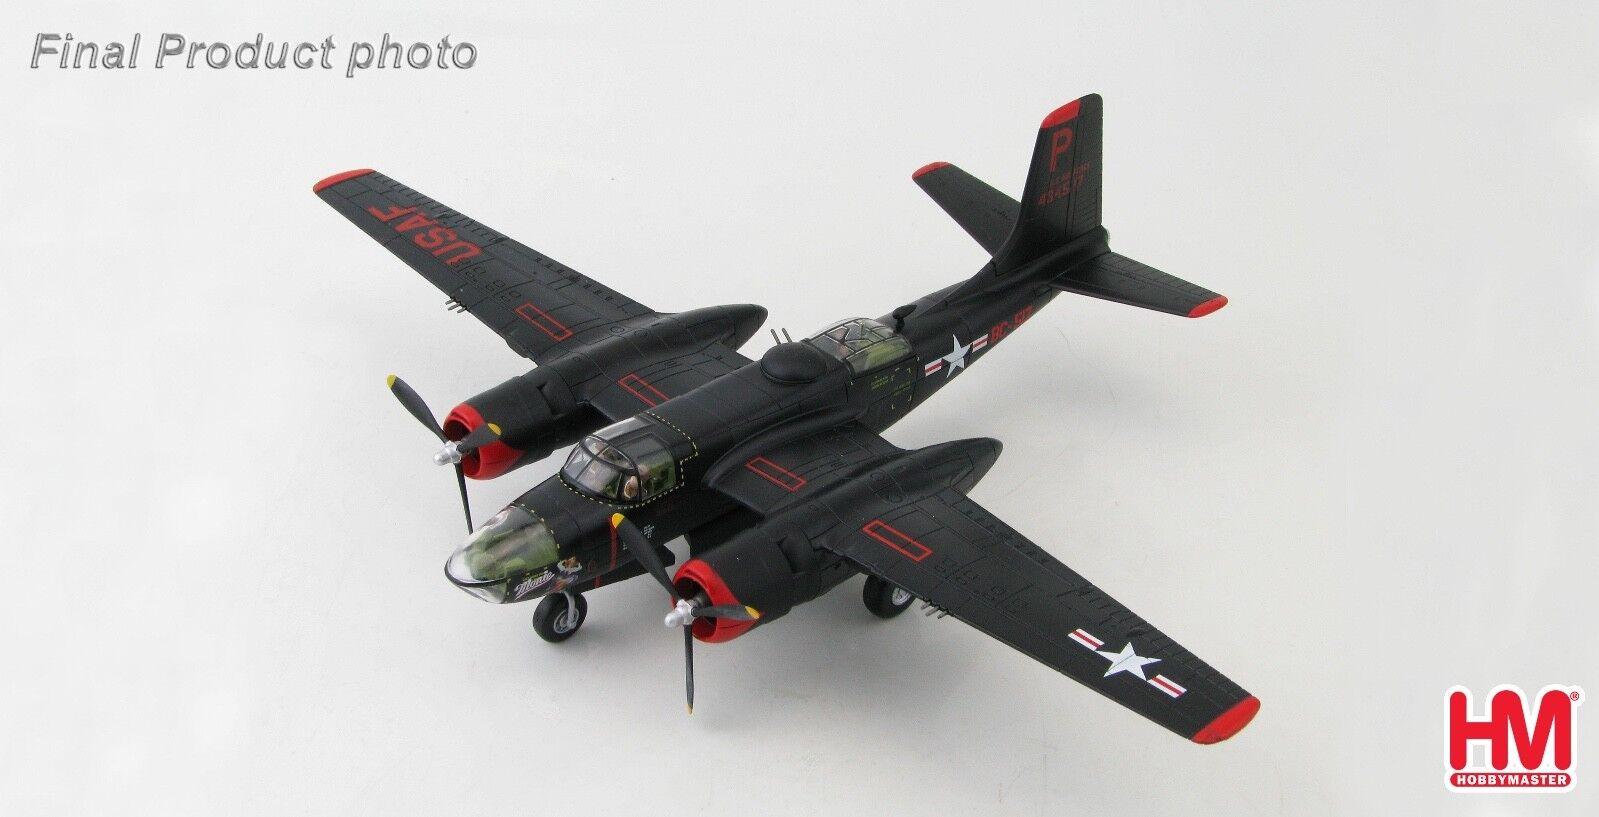 Hobby Master HA3220 1/72 Douglas A-26B 44-34517 Monie, 37th Bs, 17th BG, Corea